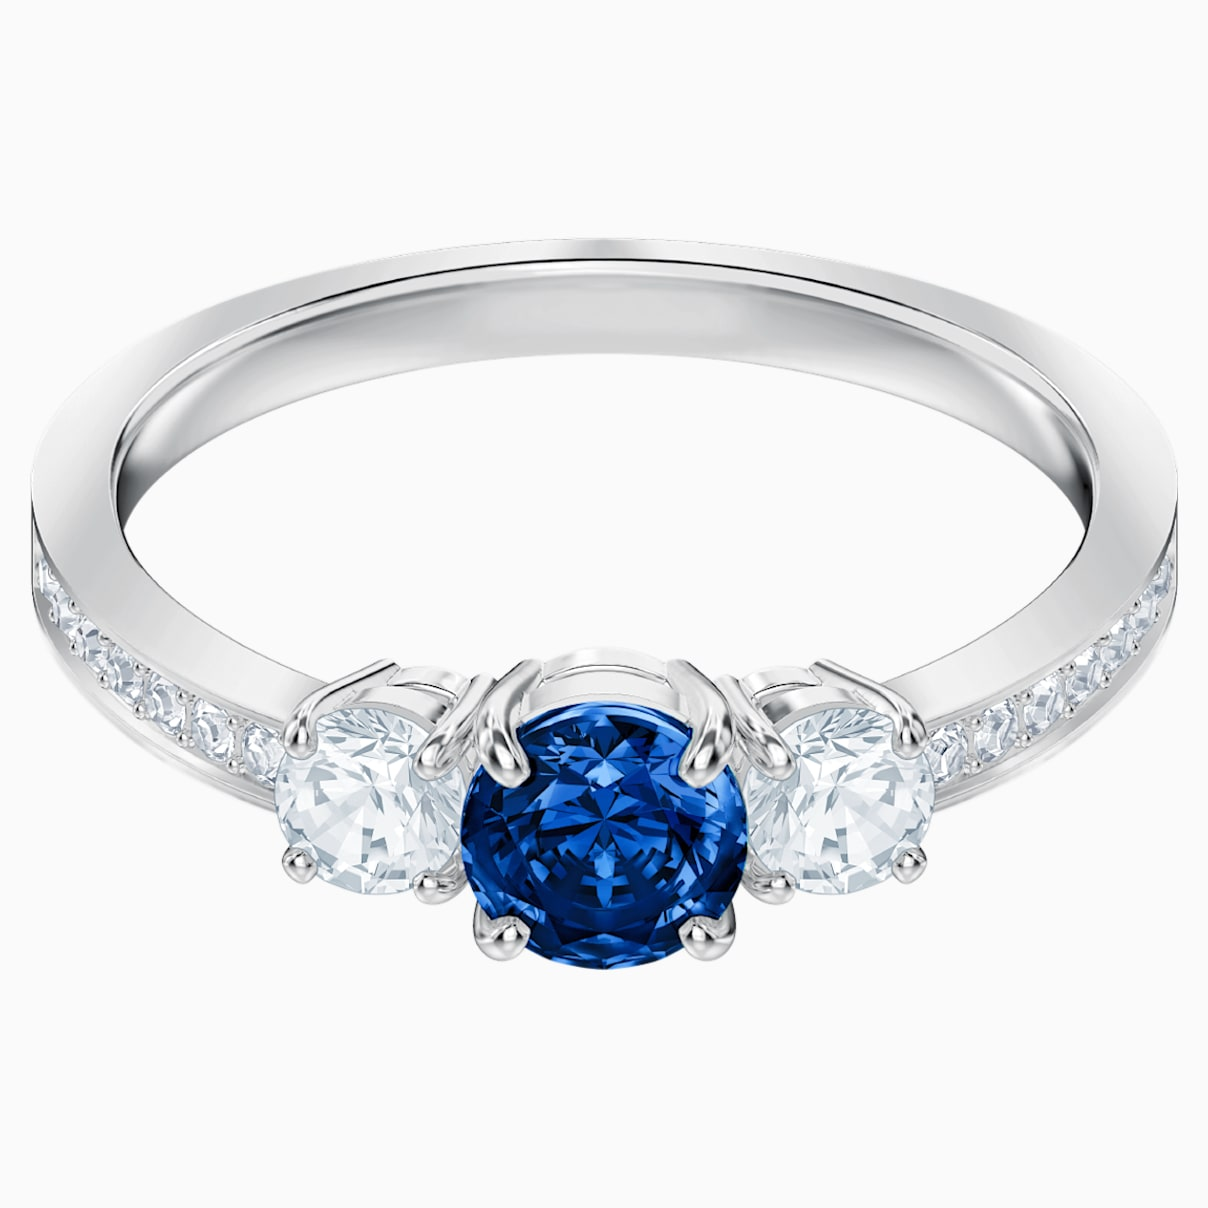 Bague attract trilogy round bleu métal rhodié